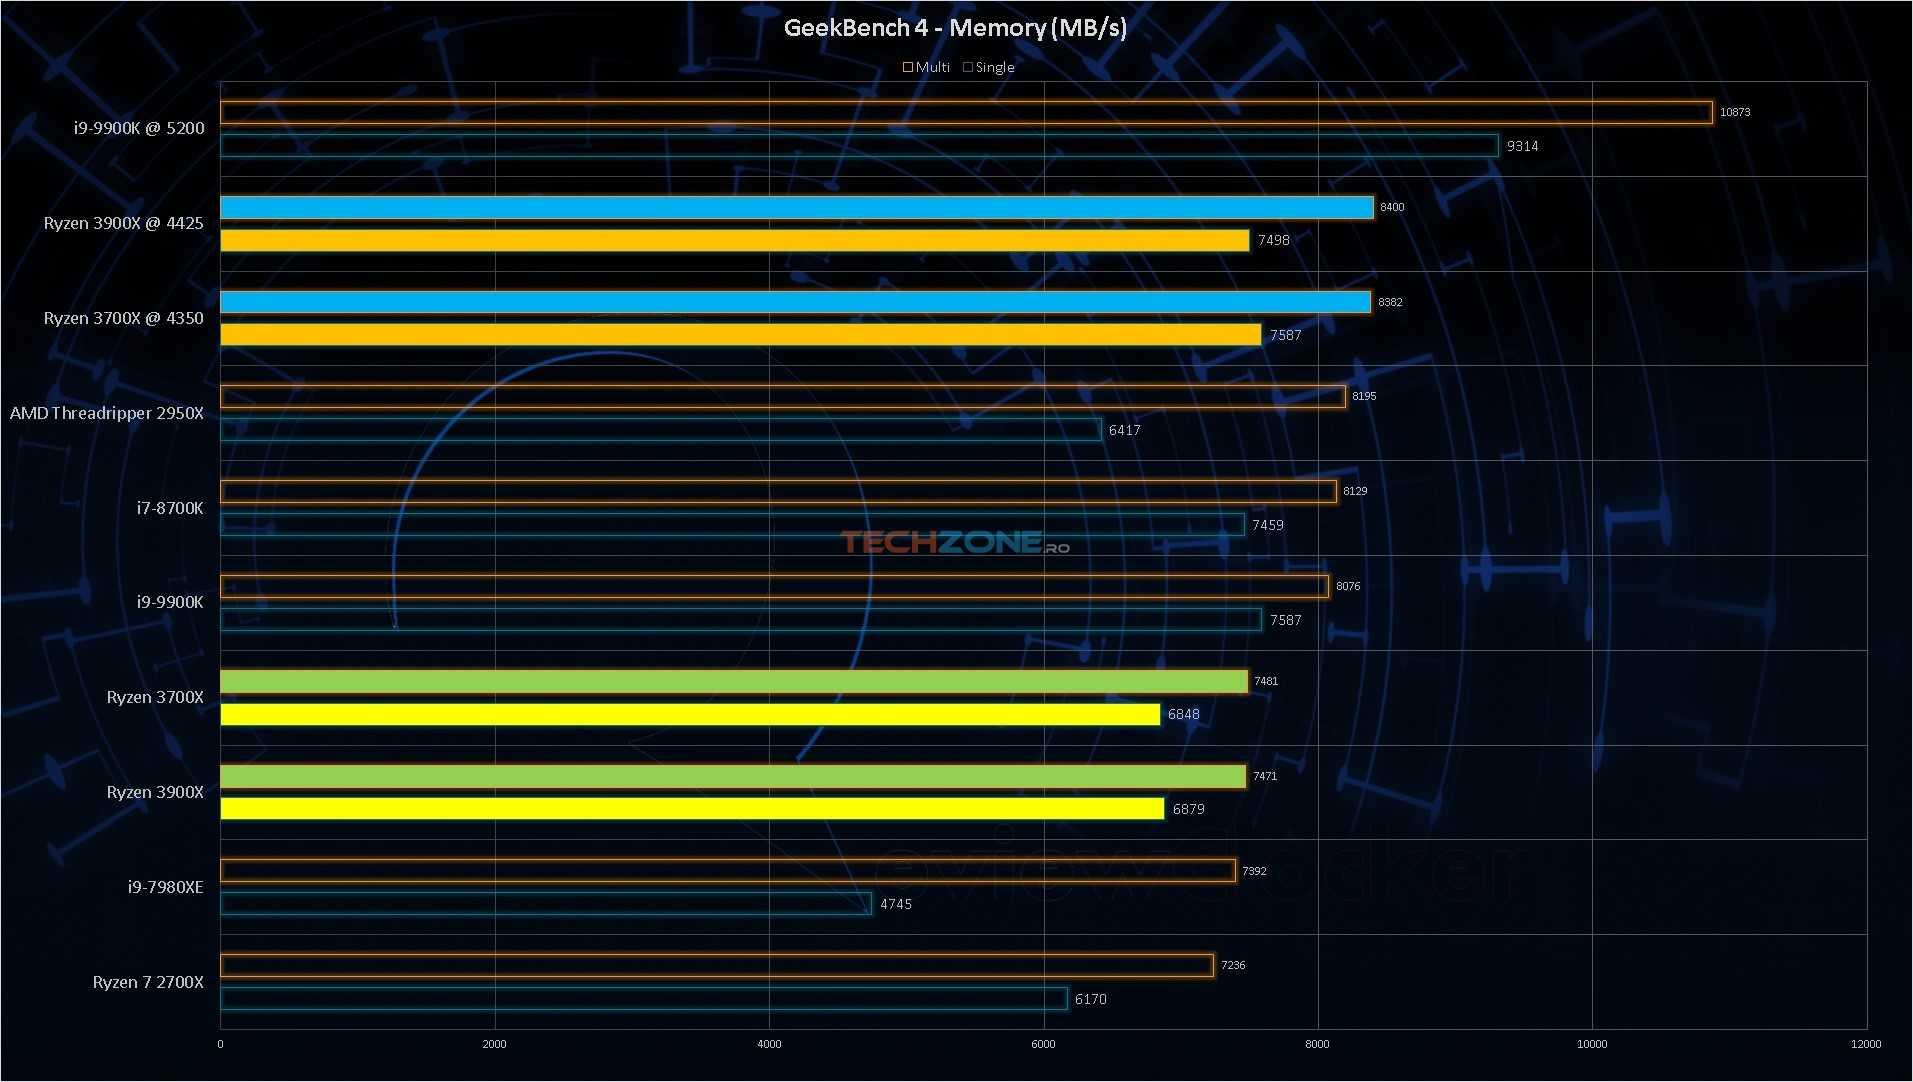 Ryzen 3000 Geekbench RAM